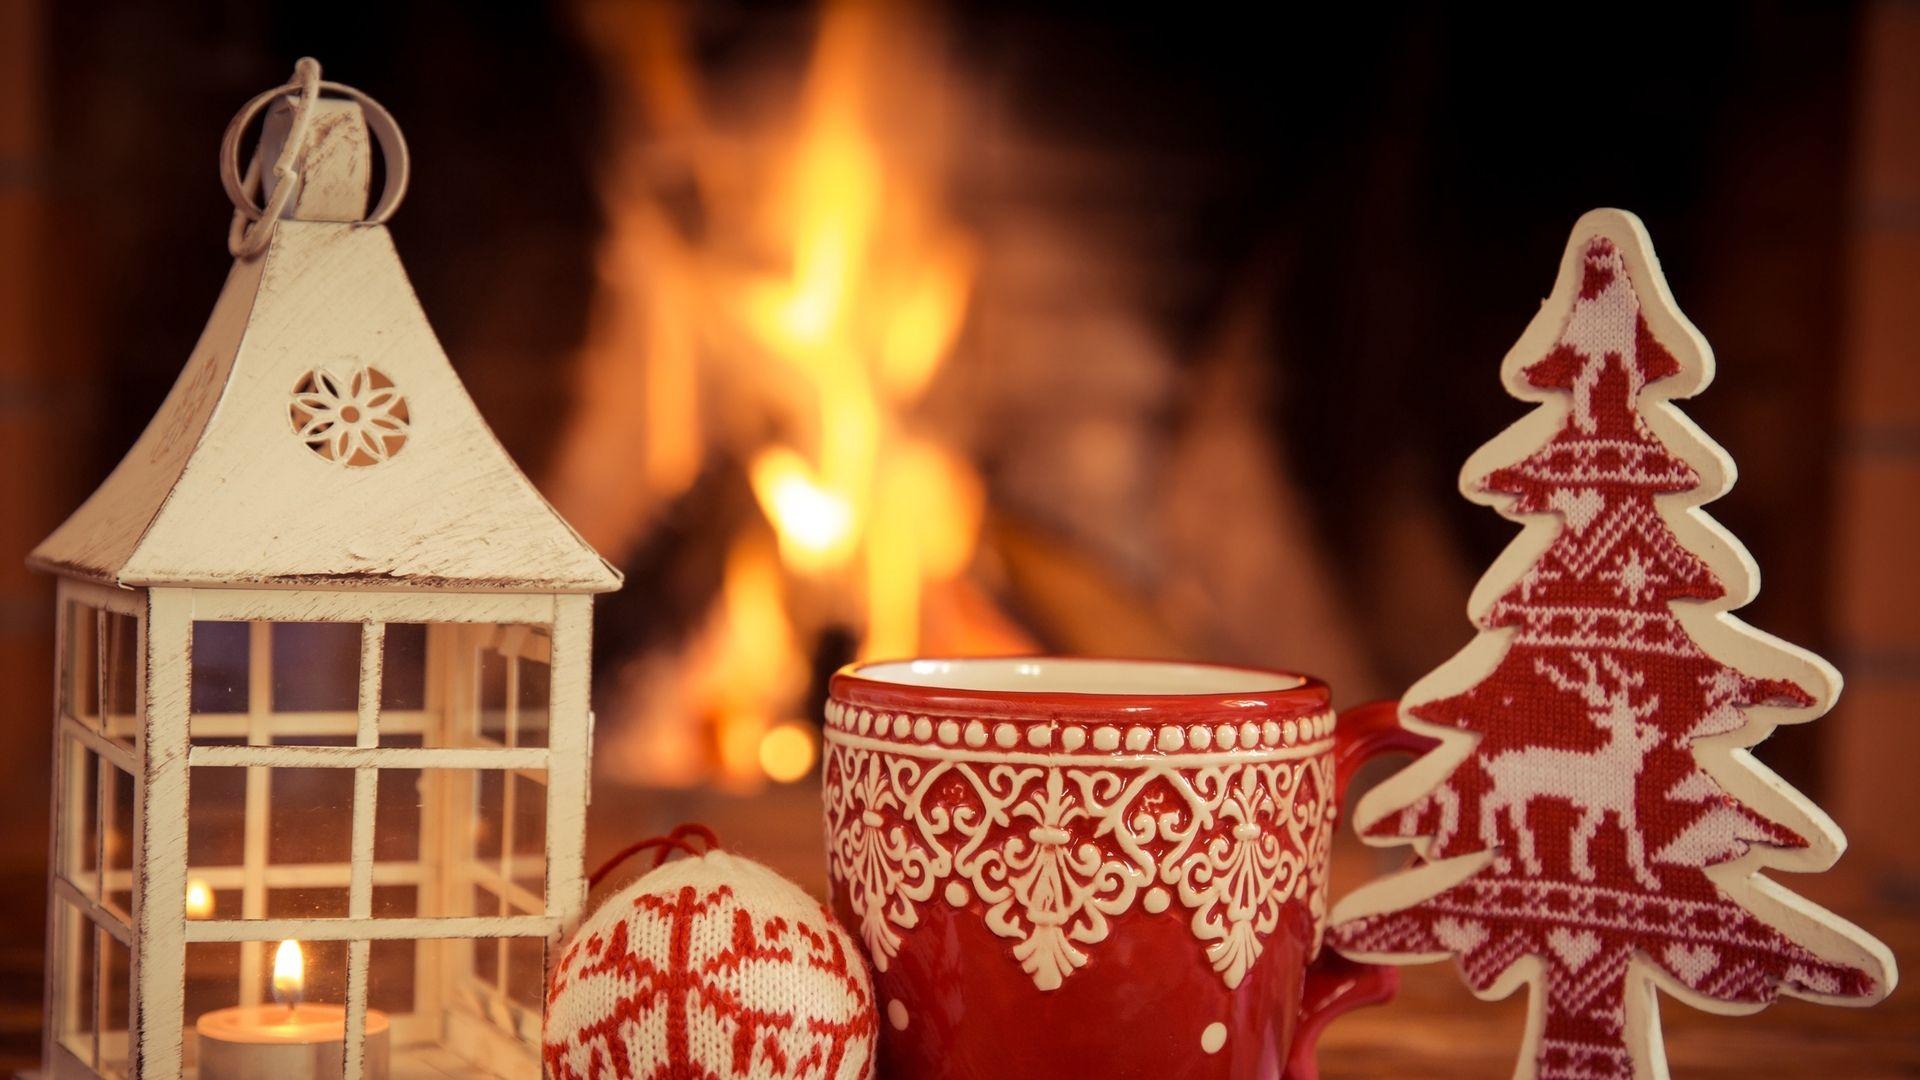 Christmas Fireplace Comfort full hd 1080p wallpaper